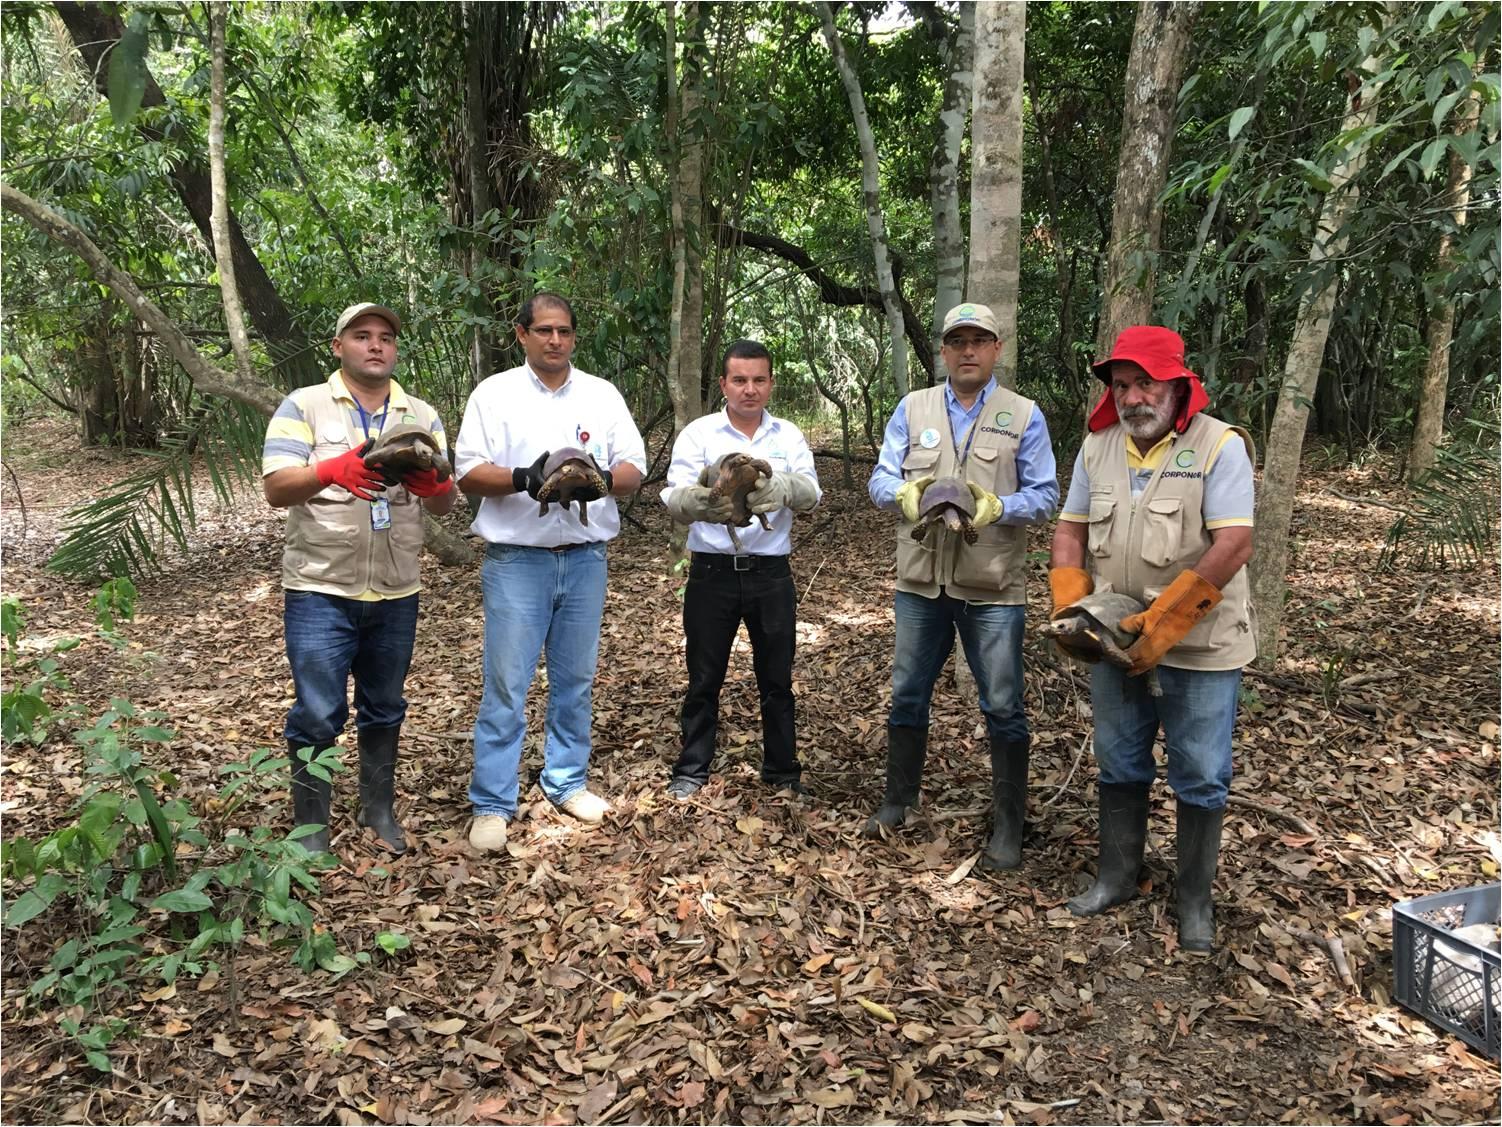 80 morrocoy tortoises were released on Drummond Ltd.'s mining land.